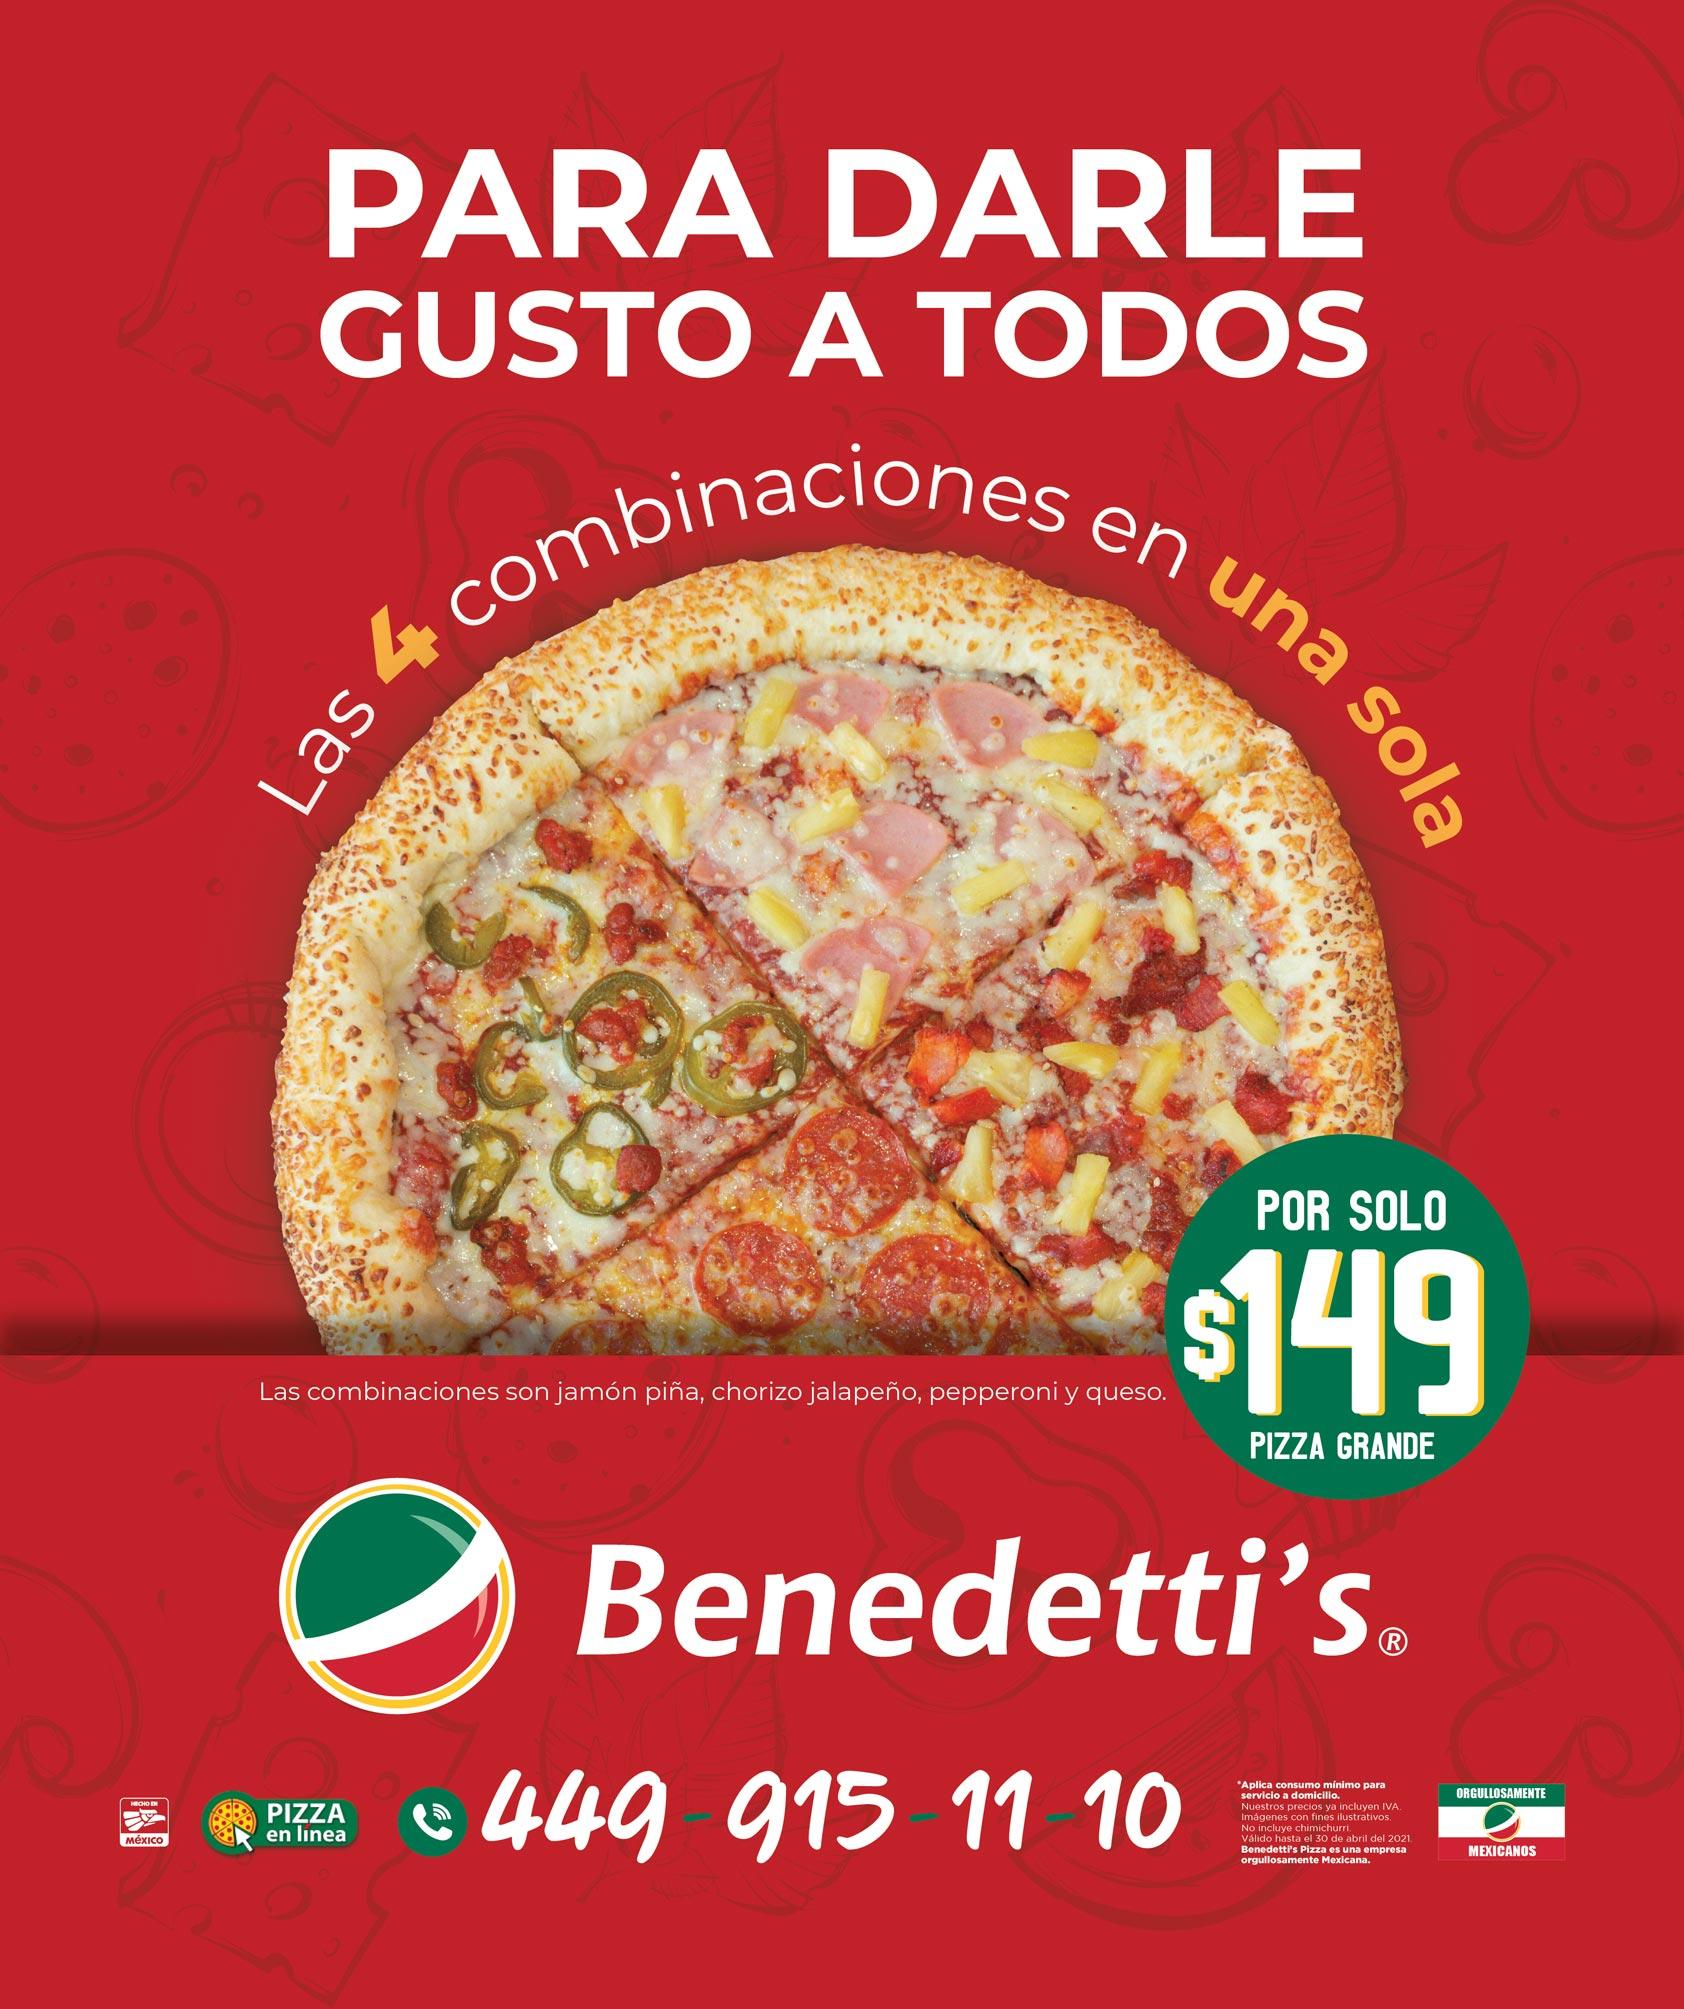 BENEDETTIS_300421